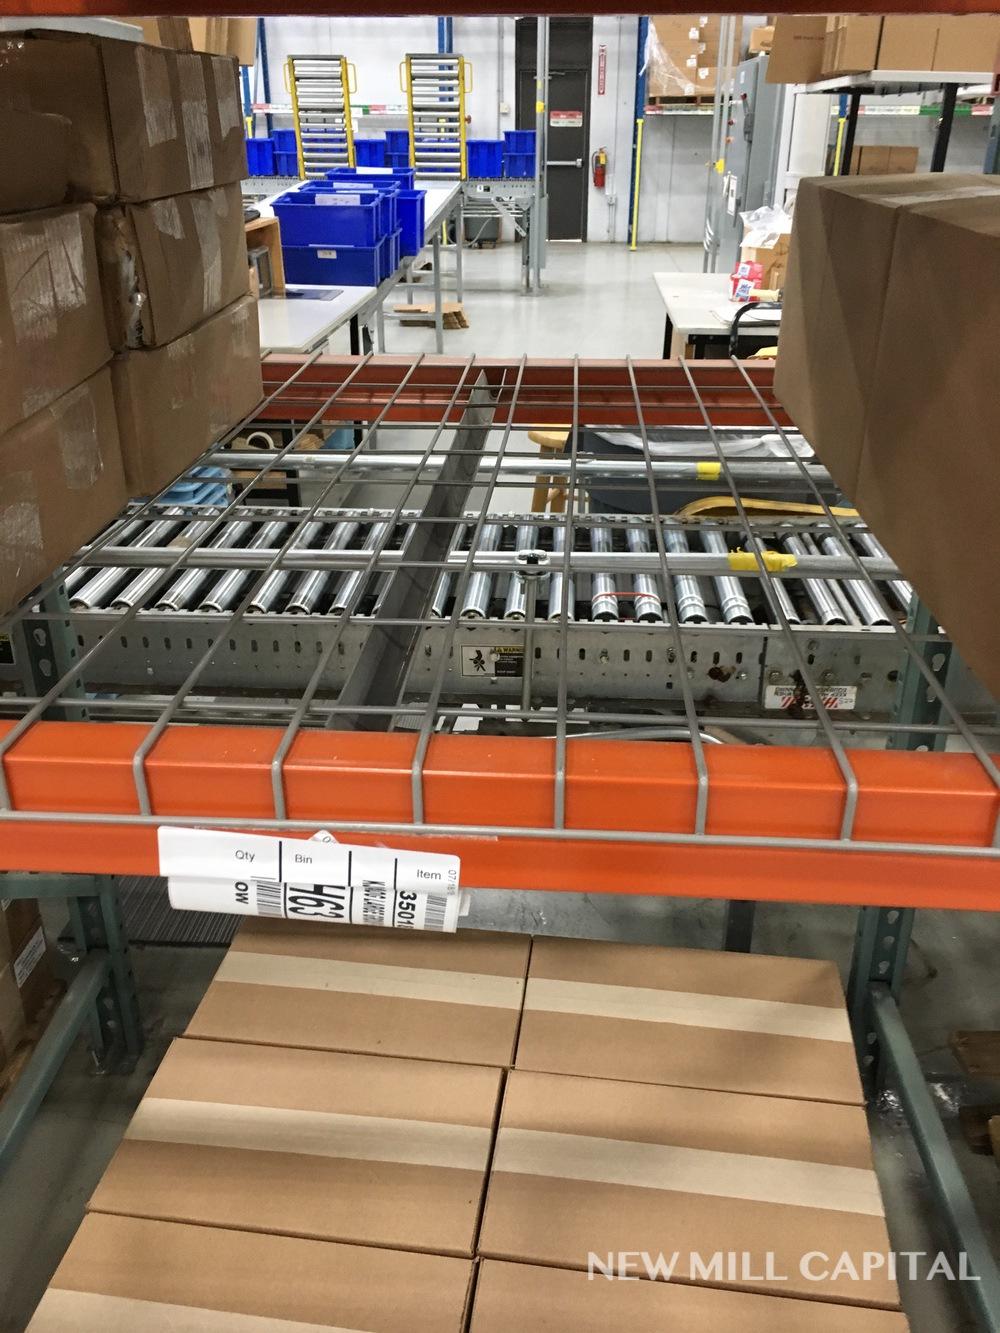 Lot 12 - Interlake Teardrop Pallet Rack, (12) Uprights (3in x 1.625in Columns, 42i | Rig: See Lot Description